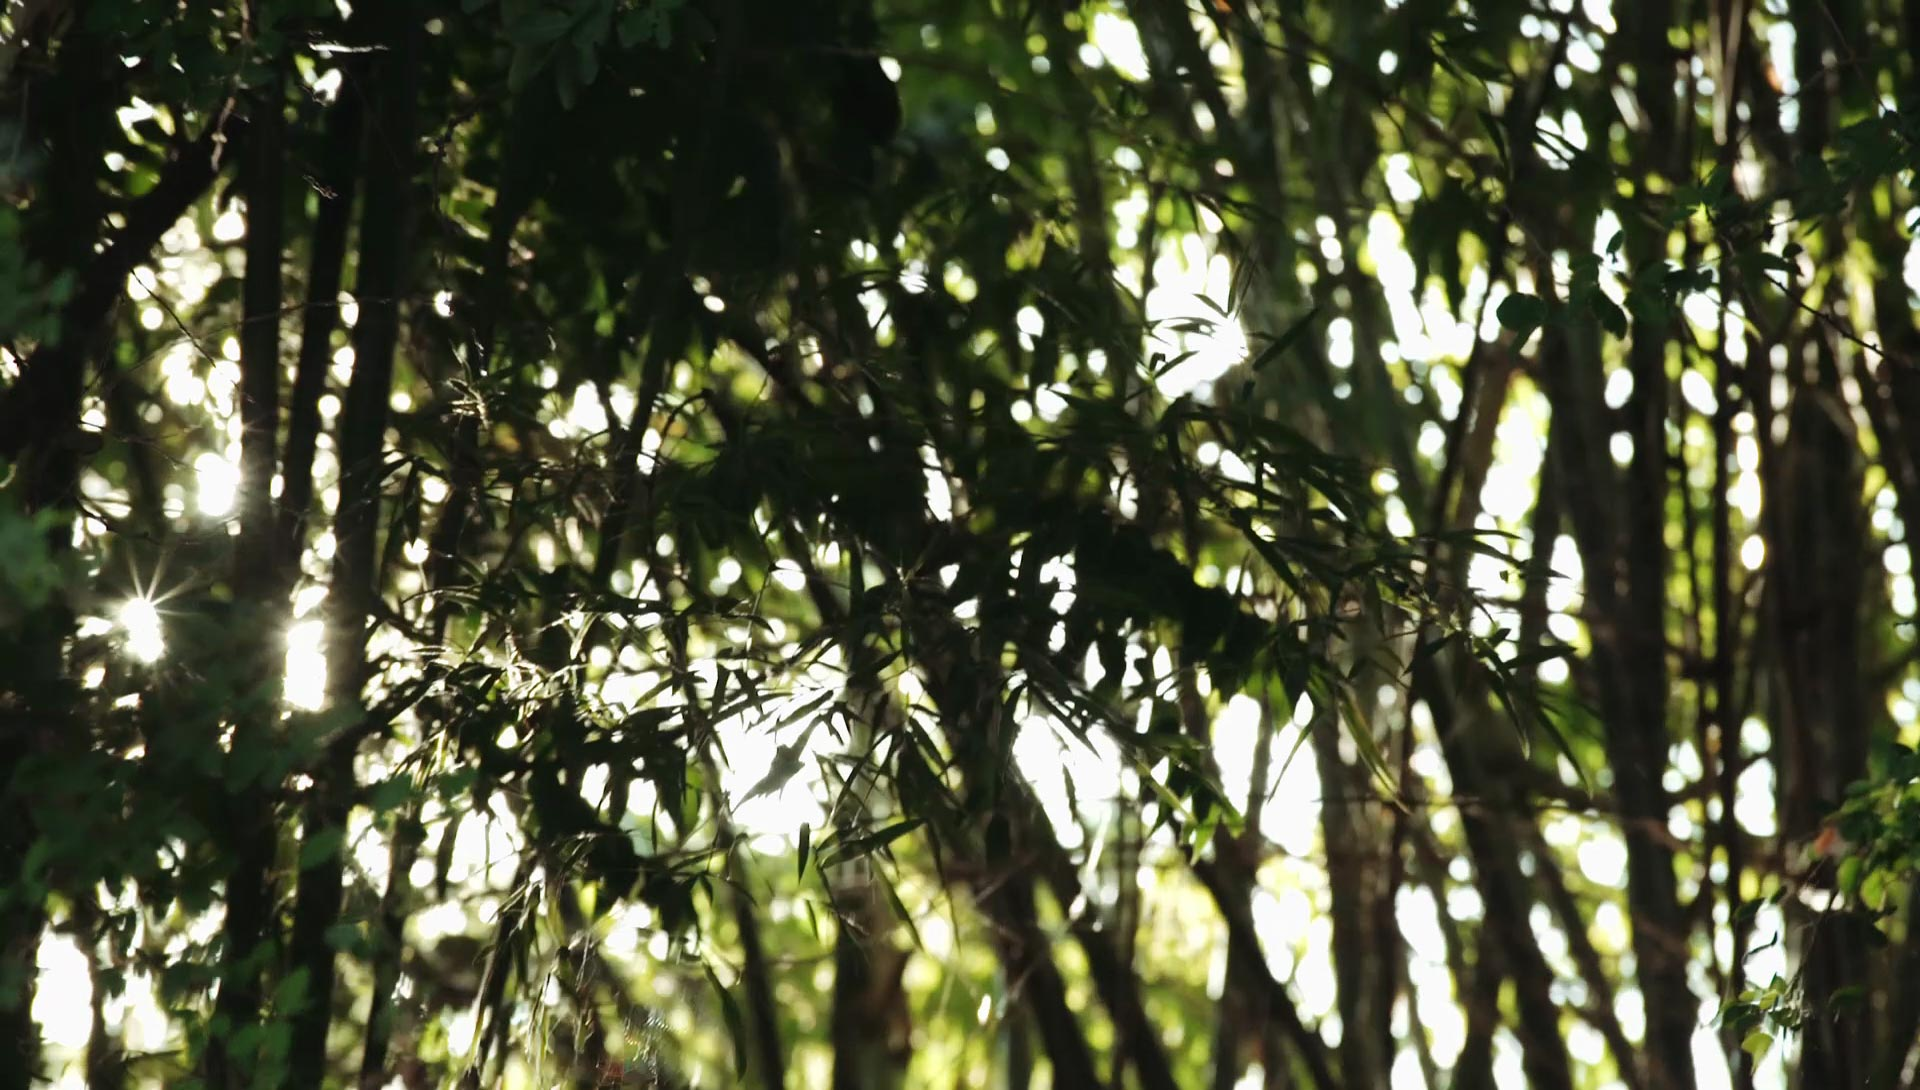 Clumps of bamboo at Daruma ecovillage